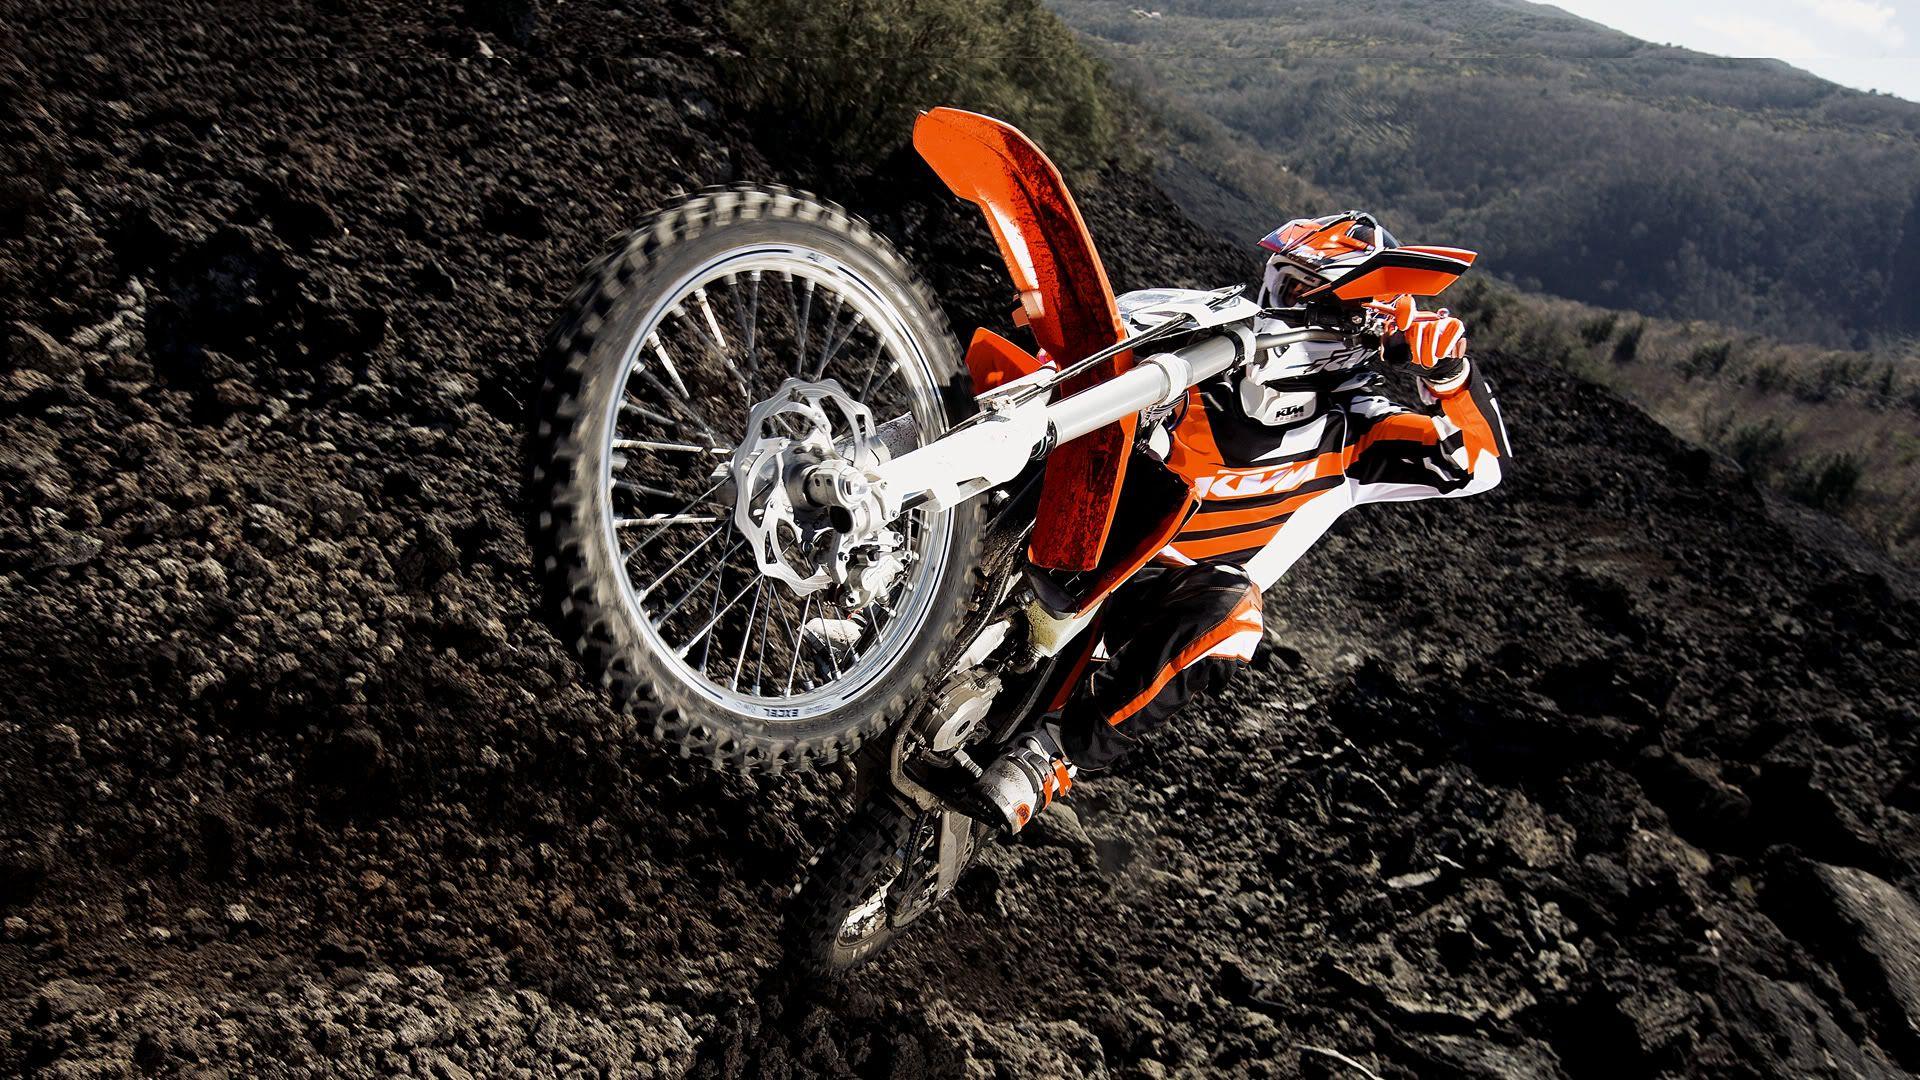 Ktm 500 Exc Jump Style Hd Wallpaper Ktm Motocross Ktm Dirt Bikes Ktm Download ktm exc wallpapers images